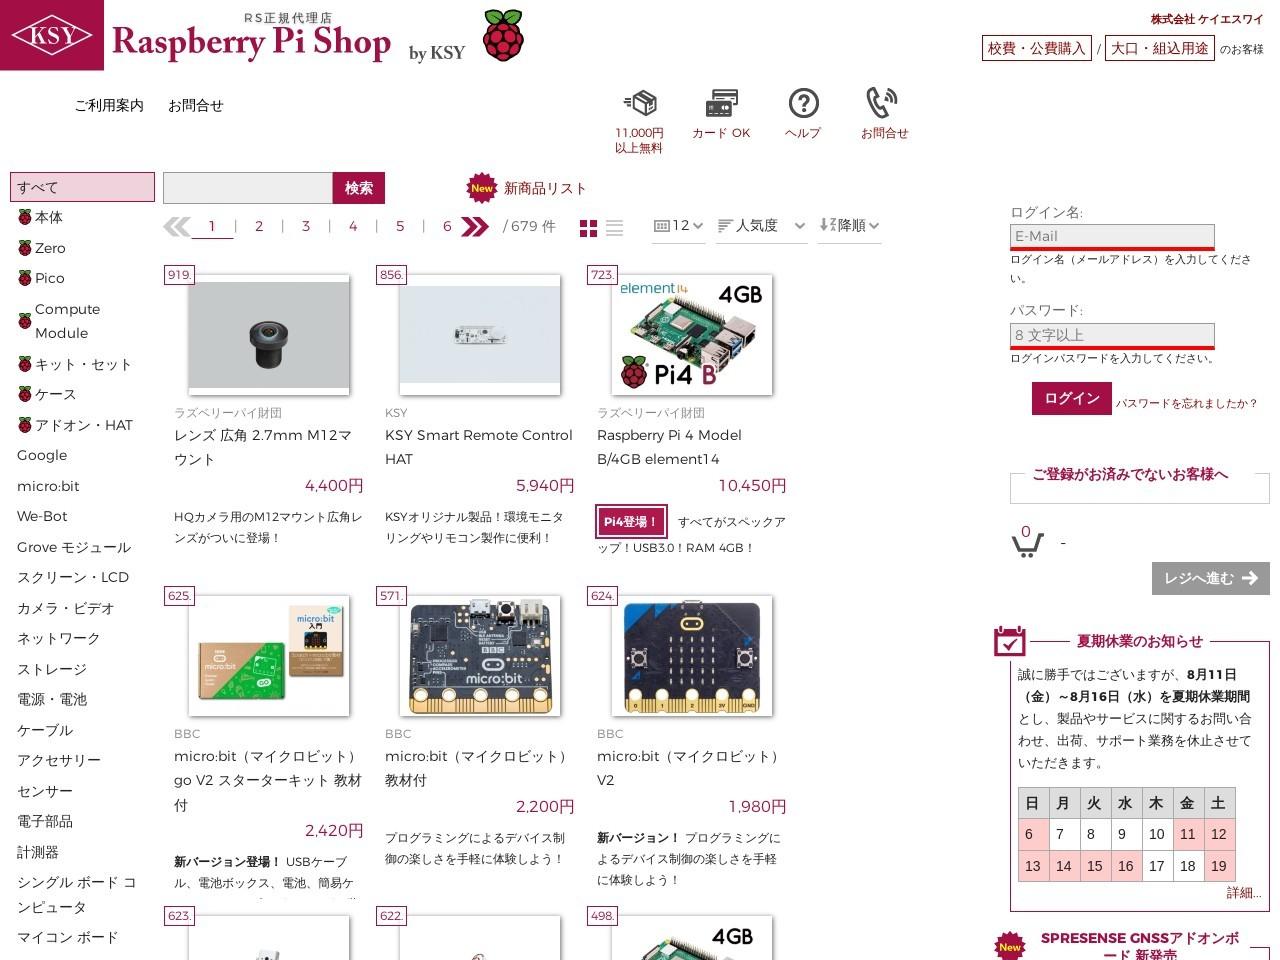 https://raspberry-pi.ksyic.com/news/page/nwp.id/30